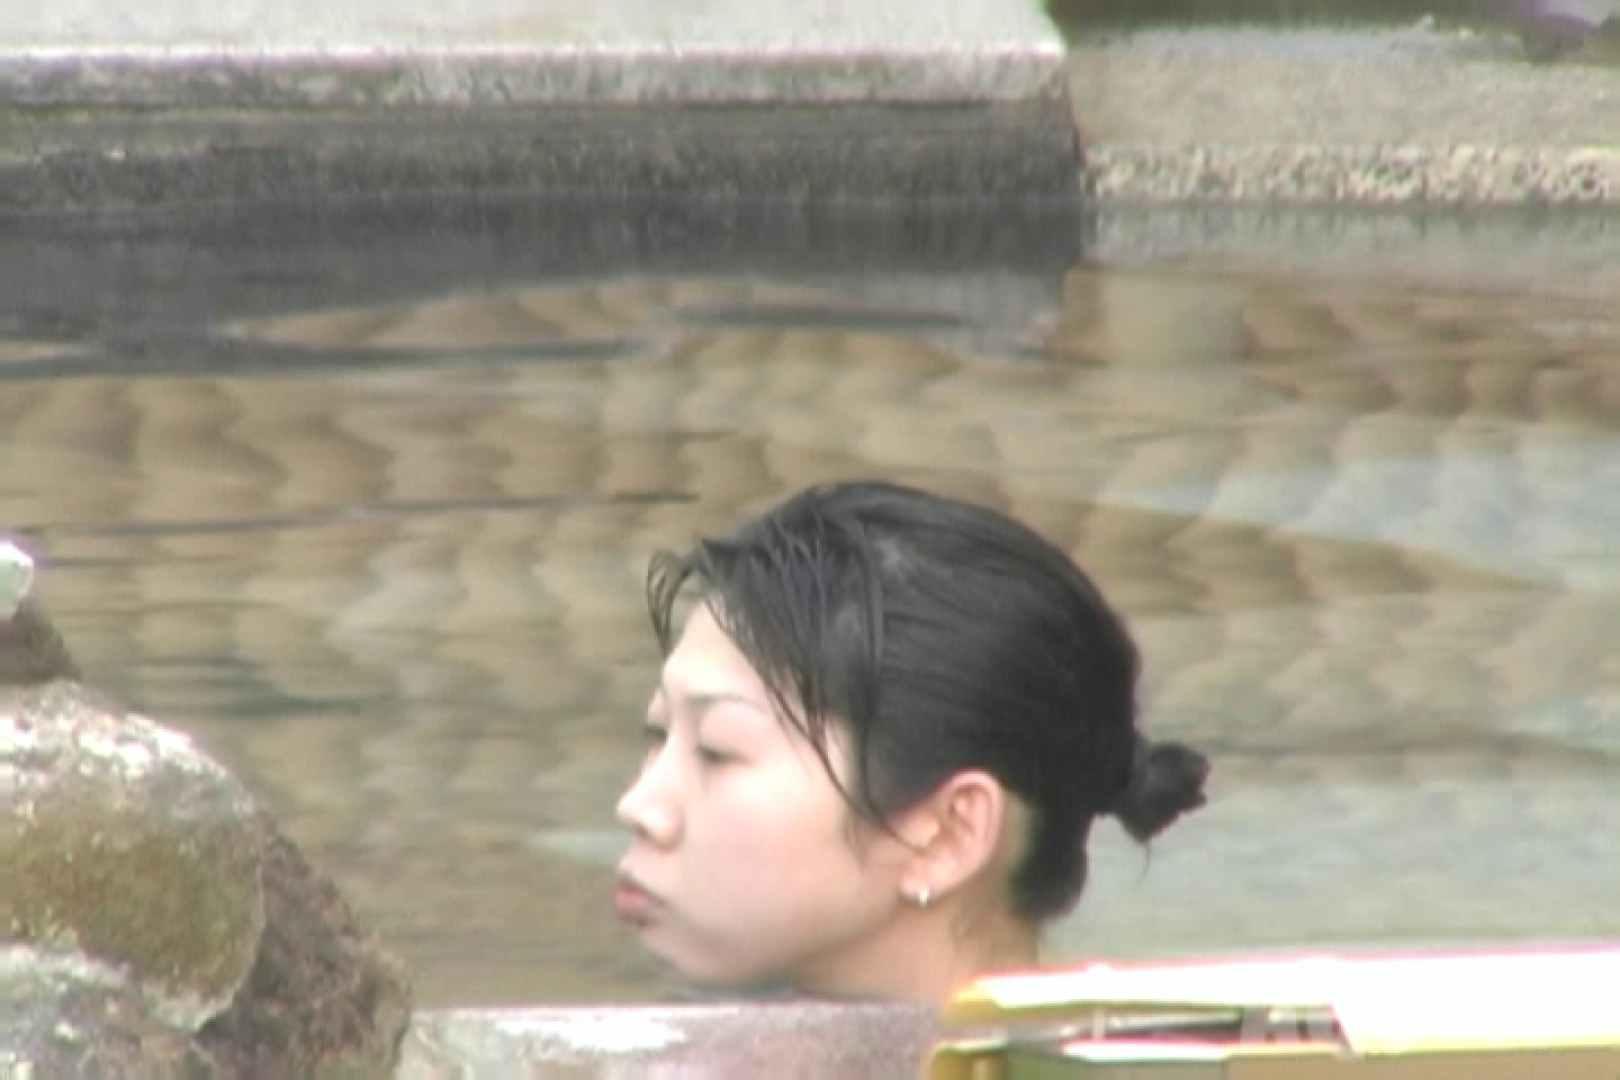 Aquaな露天風呂Vol.850 盗撮シリーズ | 露天風呂編  88PIX 63